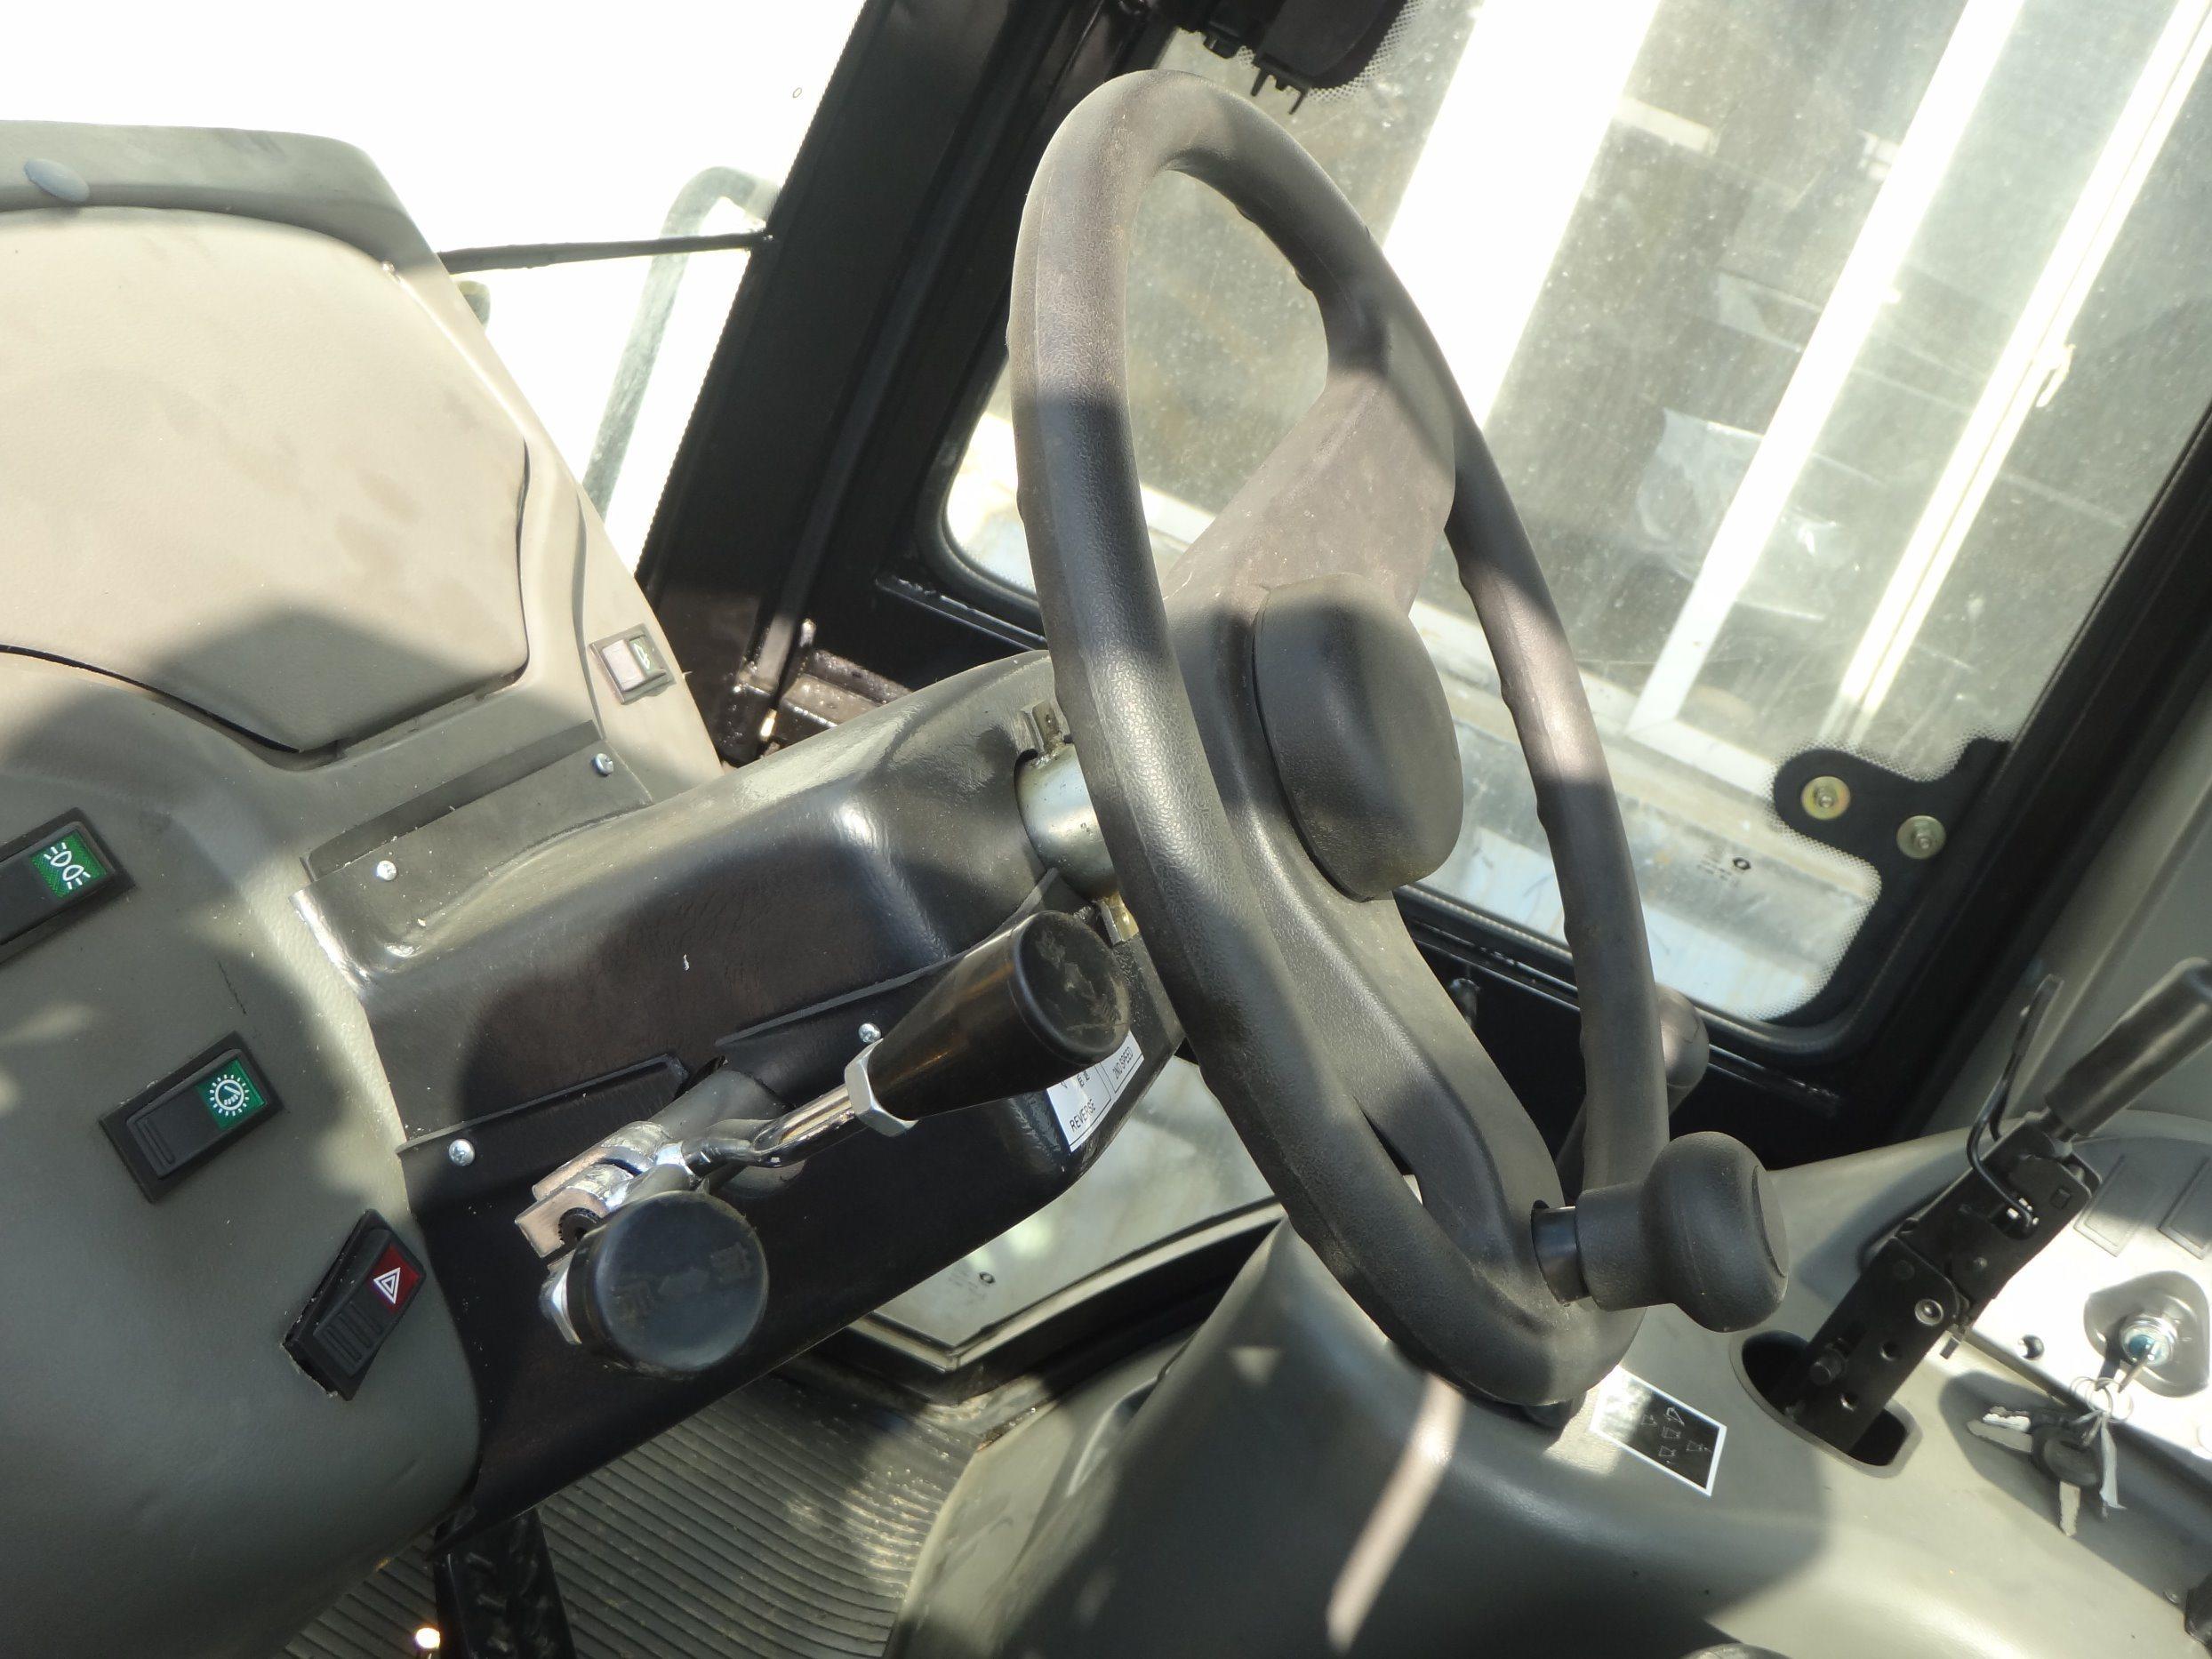 Backhoe Wz30-25 Wheel Loader Yineng